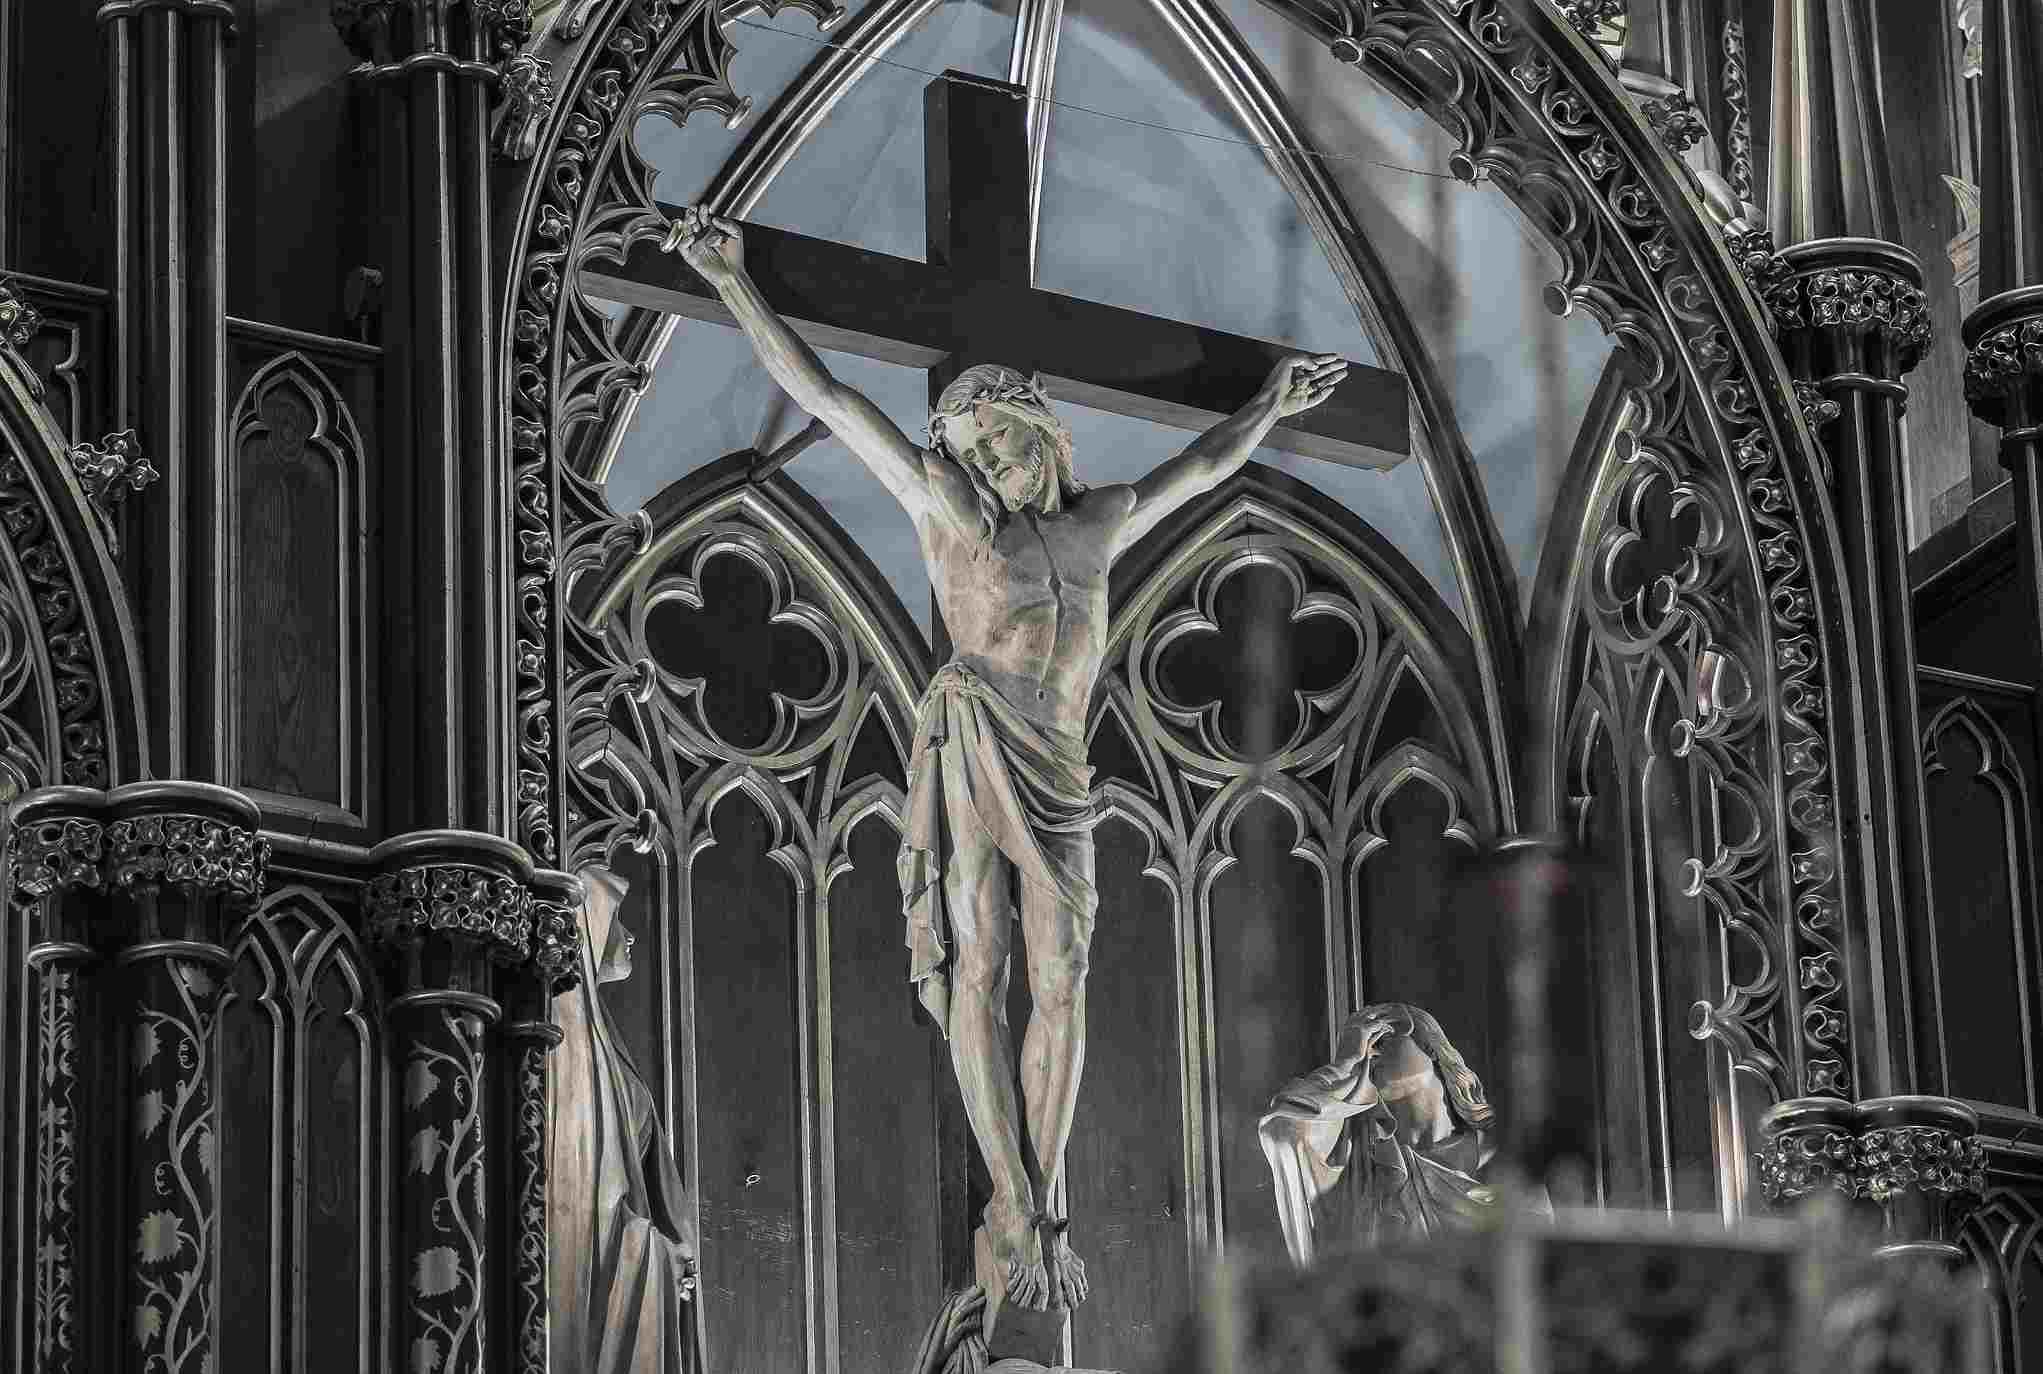 notre-dame-montreal-basilica-chun-yip-so-02.jpg